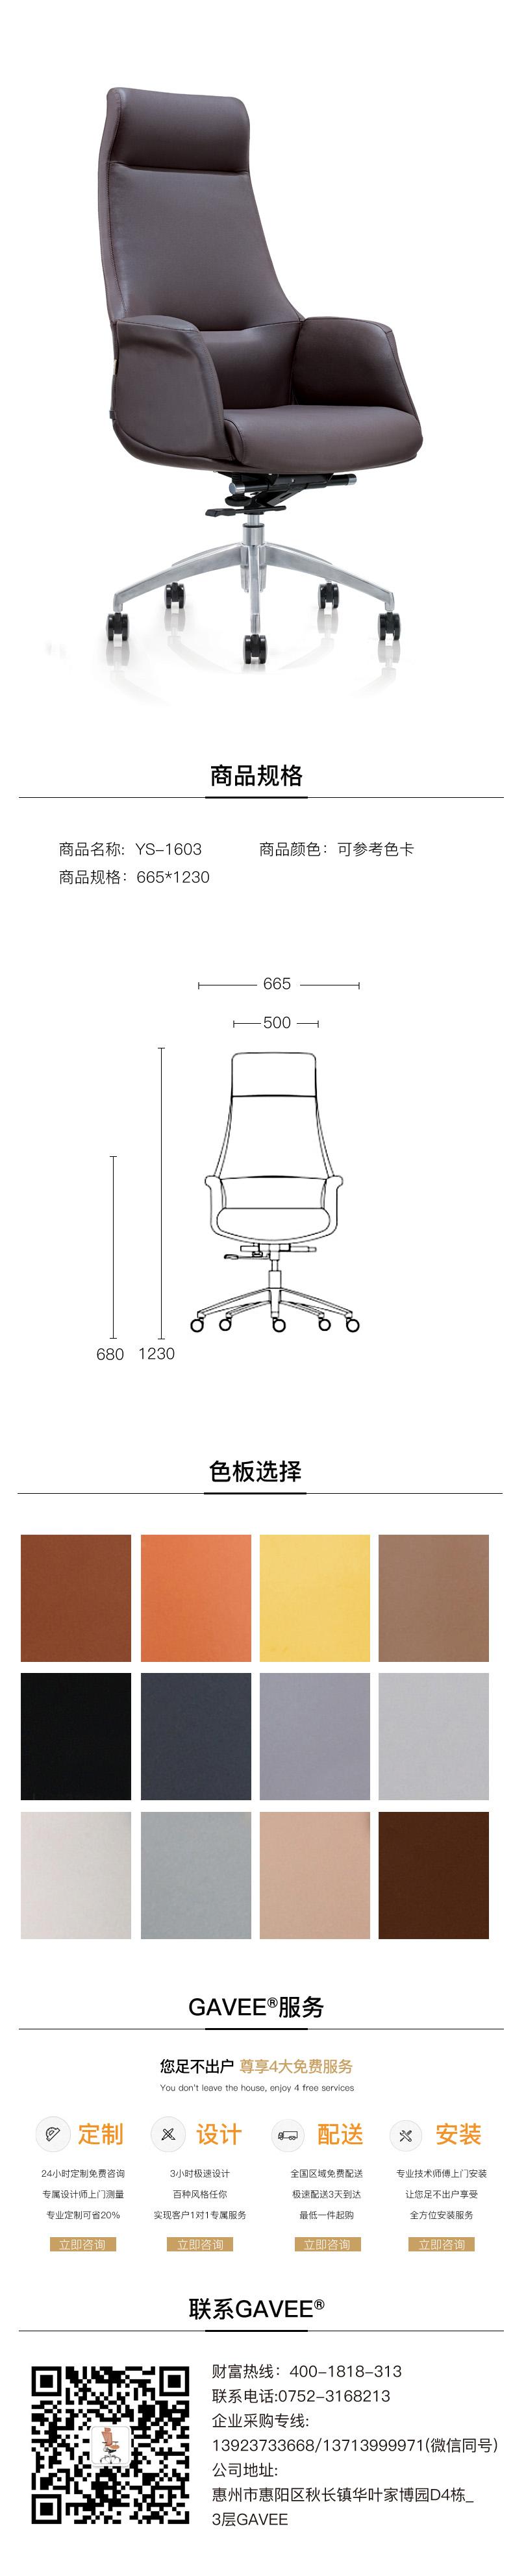 YS-1603 拷貝.jpg